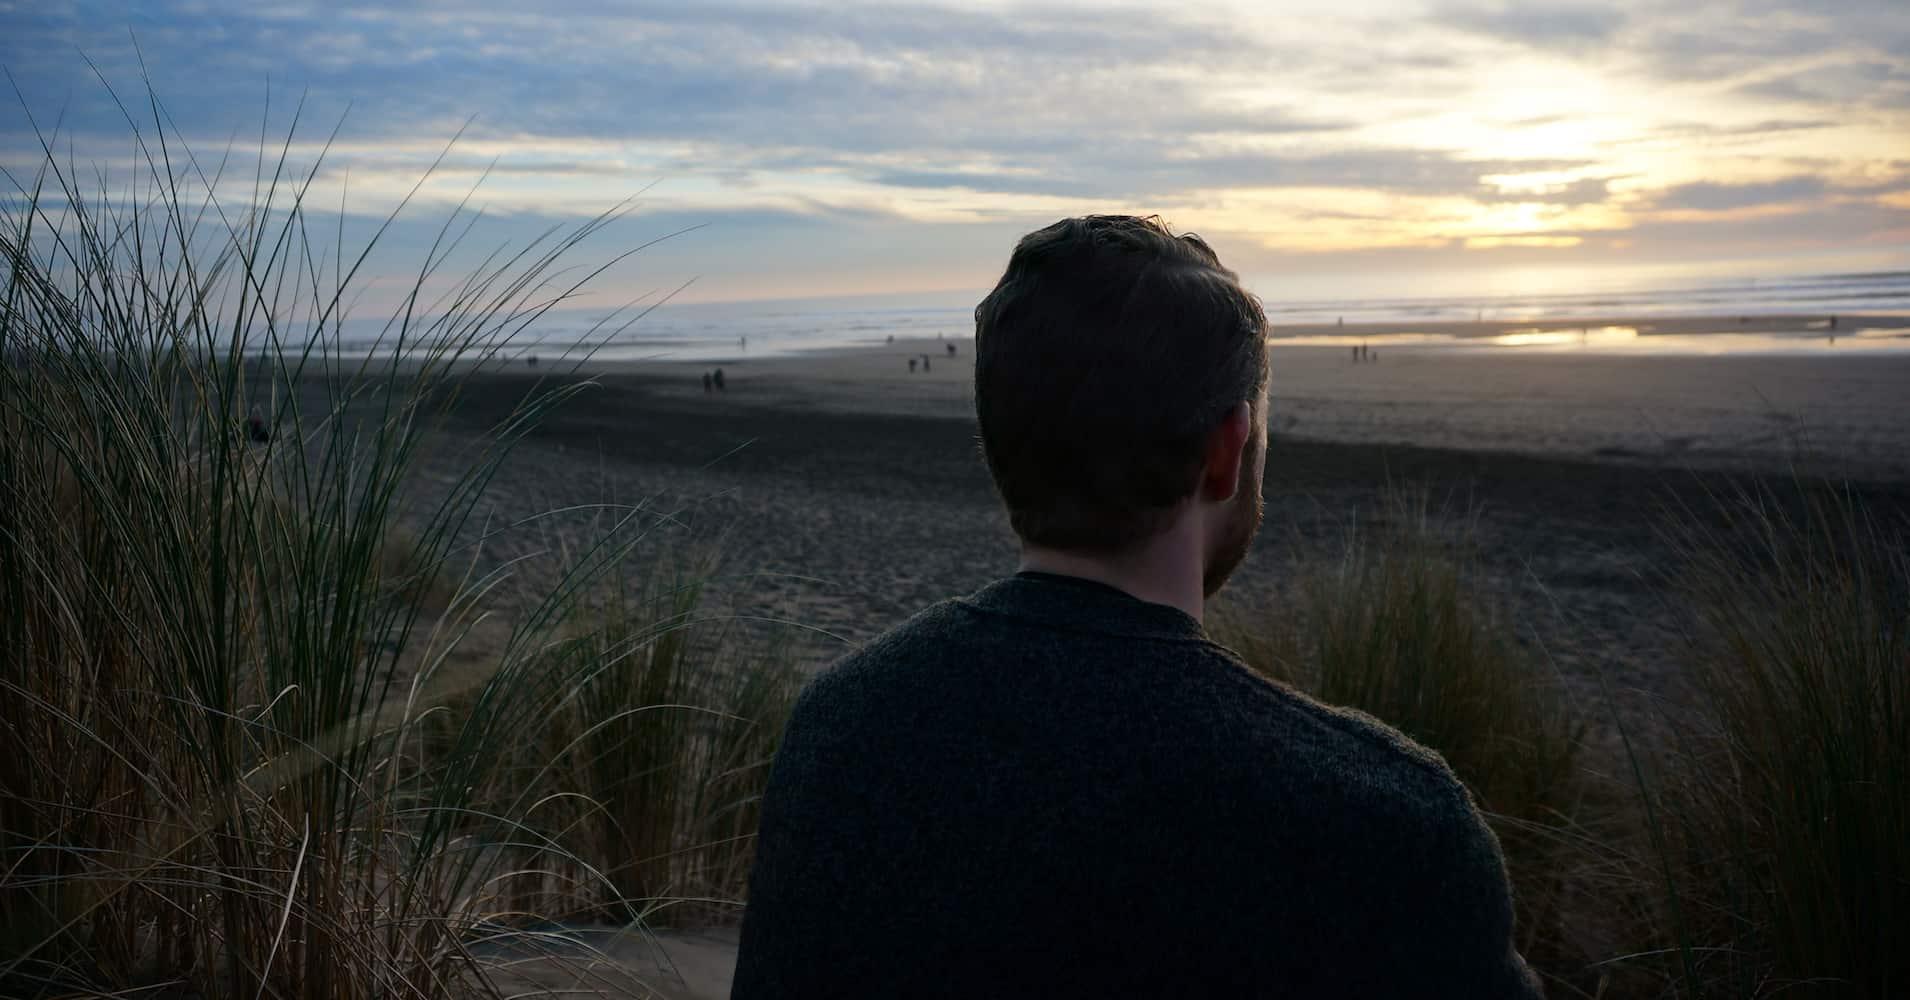 Introducing Mr  Valise: My #1 Travel Buddy & Life Partner